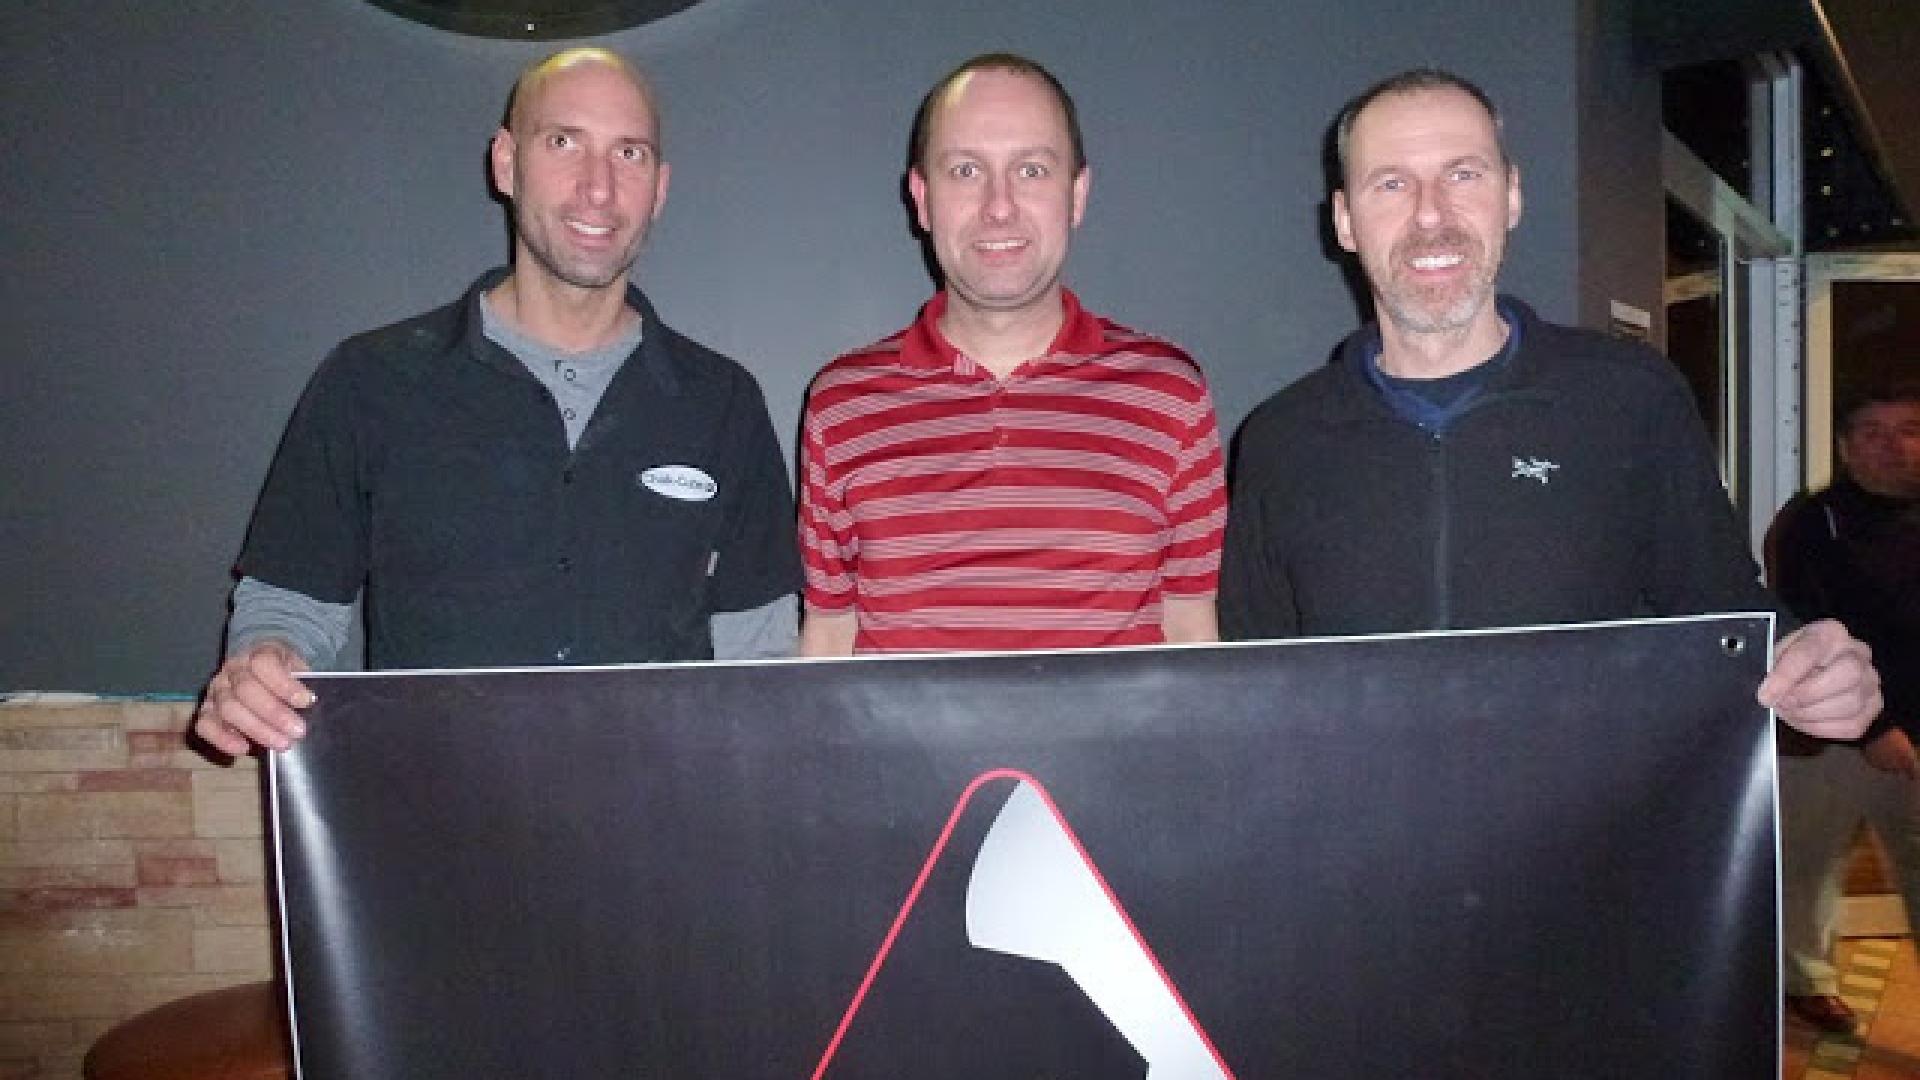 Martin Daigle, Alain Parent, Danny Hewitt